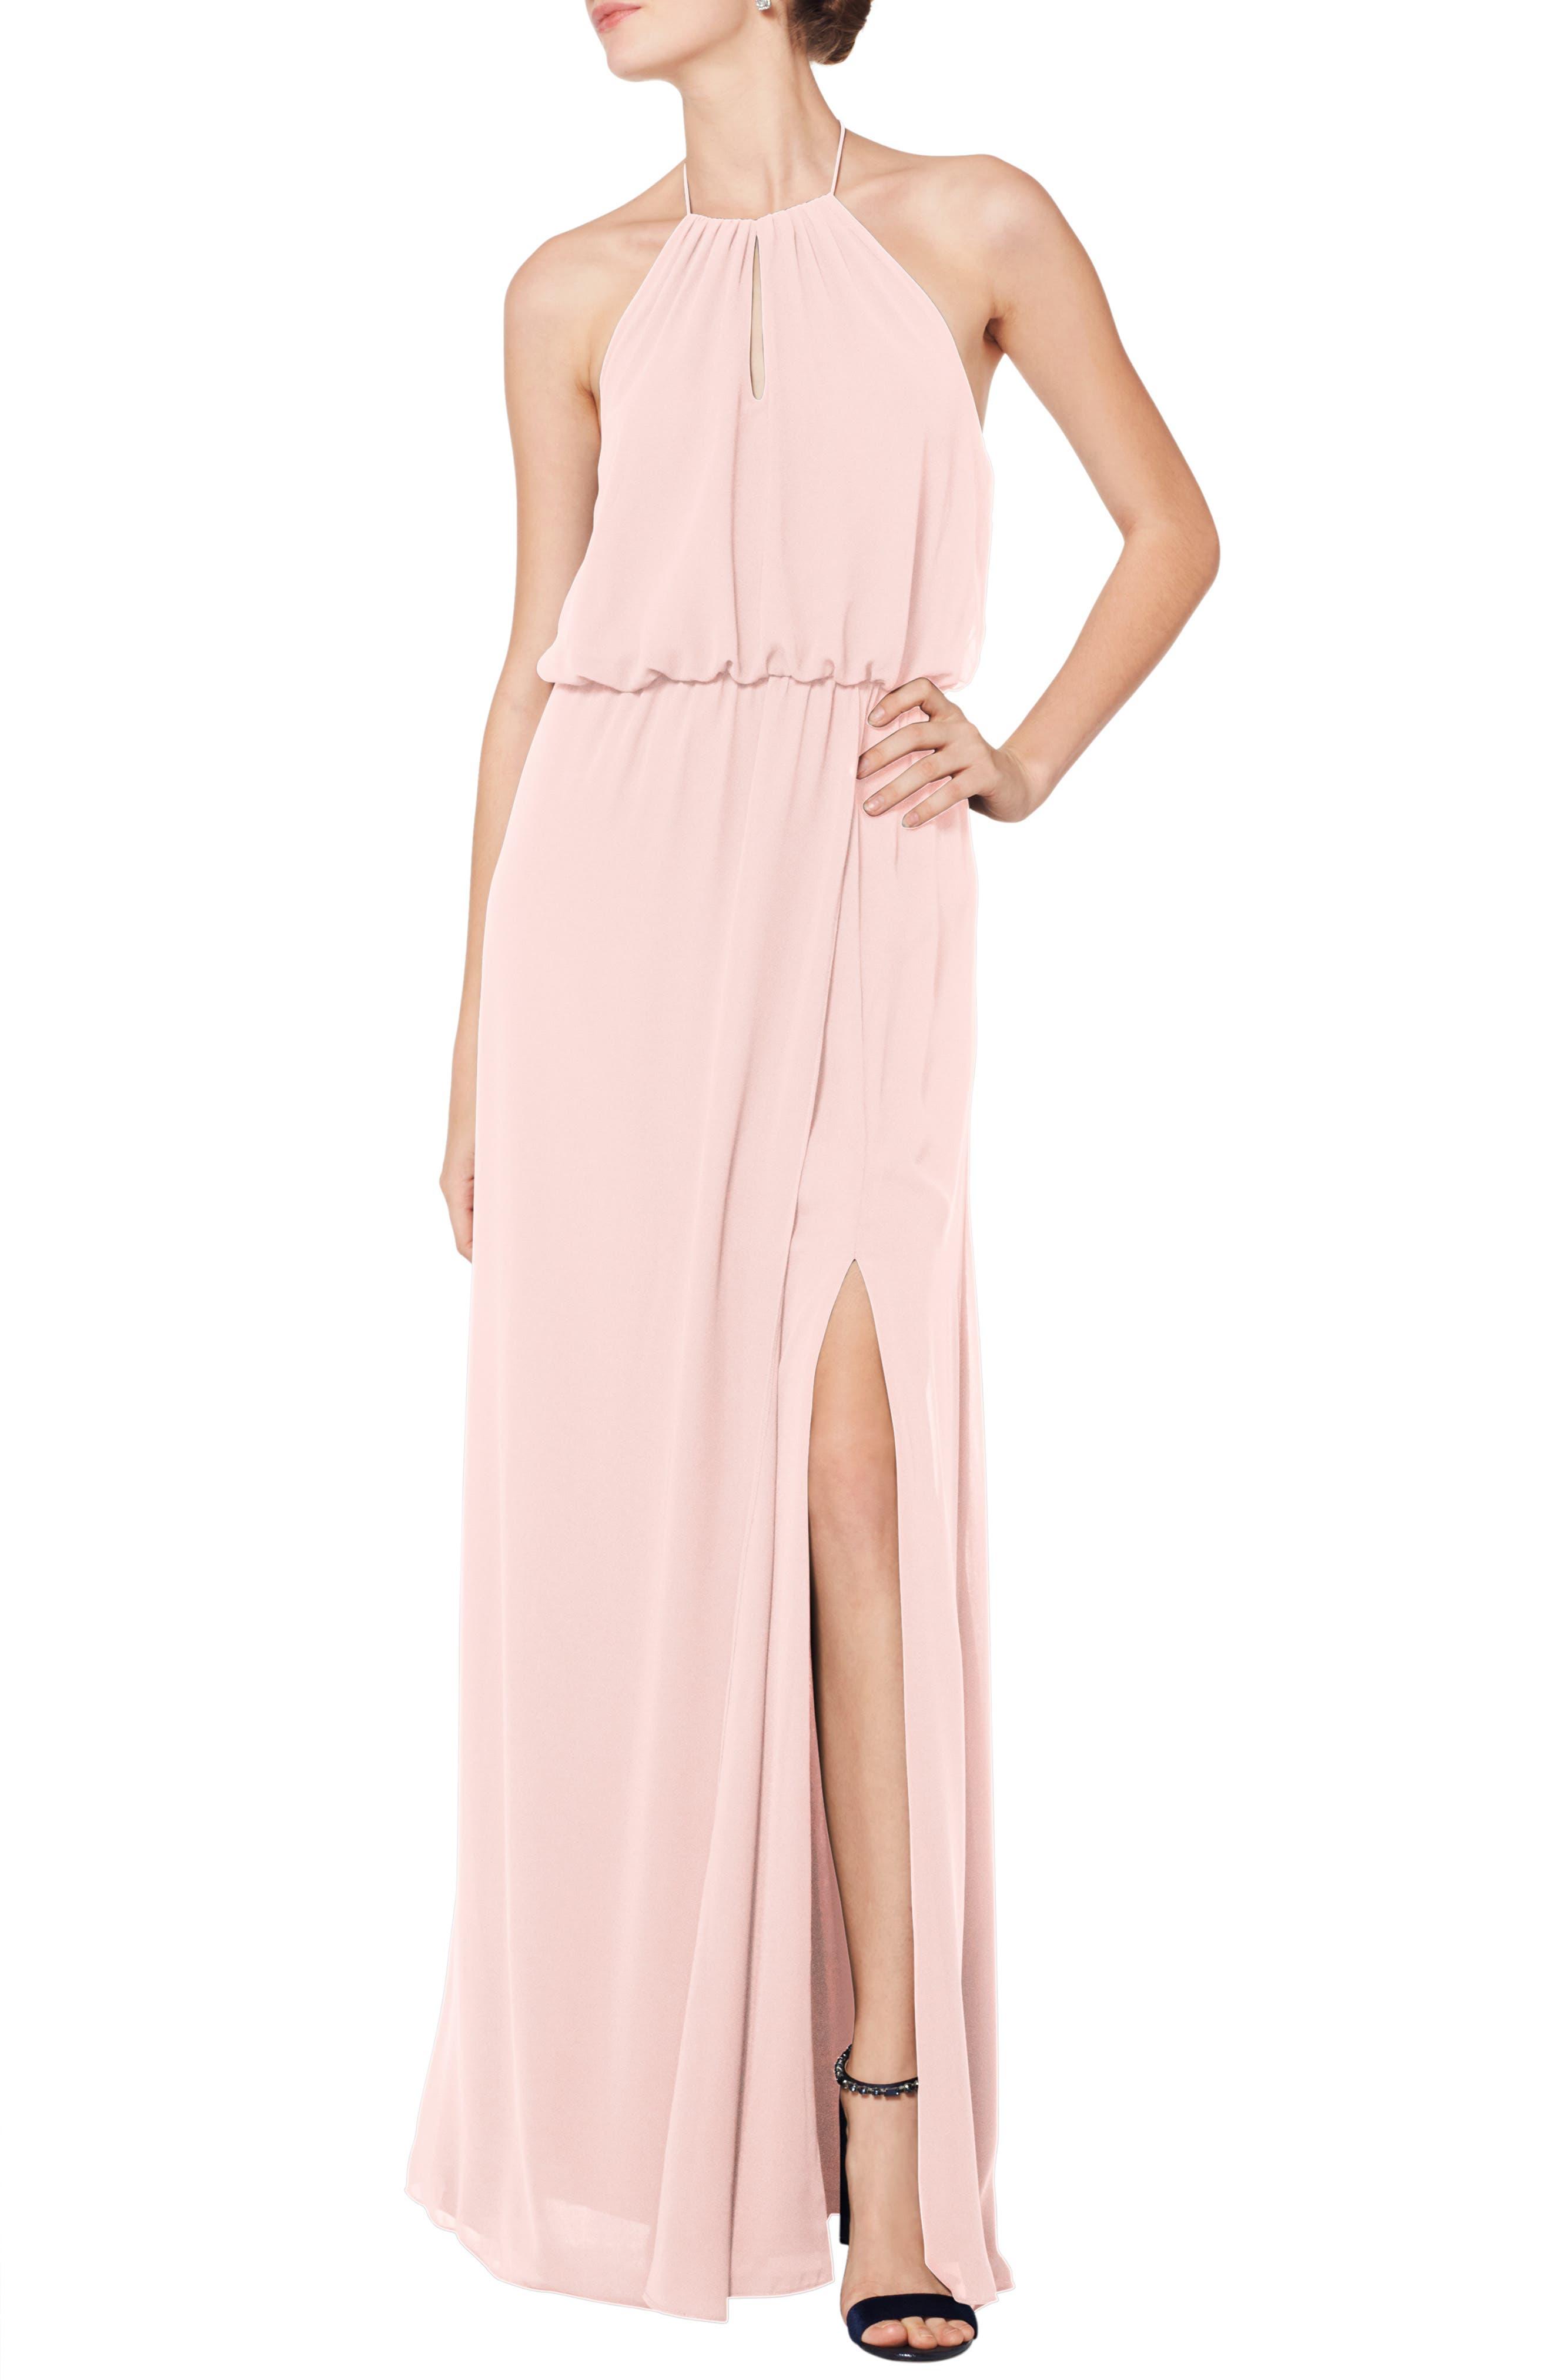 #levkoff Halter Keyhole Blouson Chiffon Evening Dress, Pink